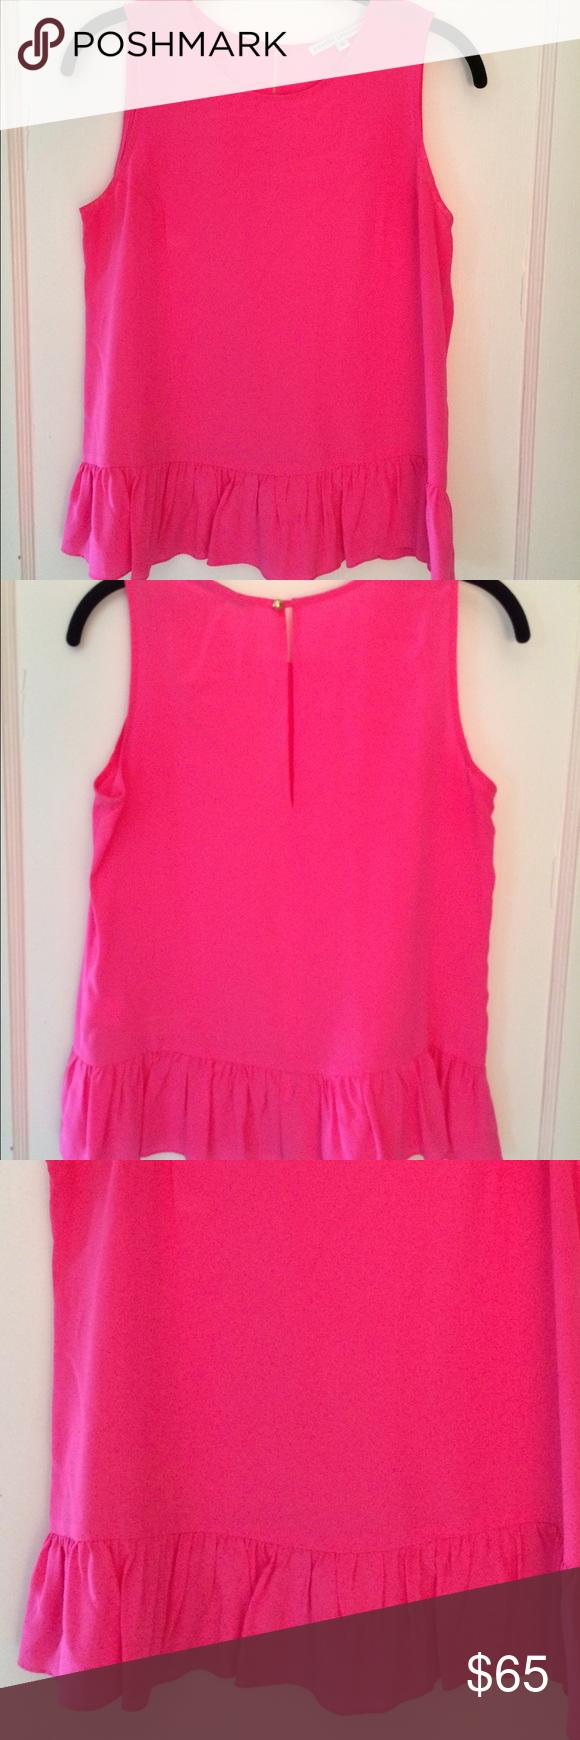 02d575304c95 Amanda Uprichard Top. Amanda UprichardHot PinkBlousesShirt ...